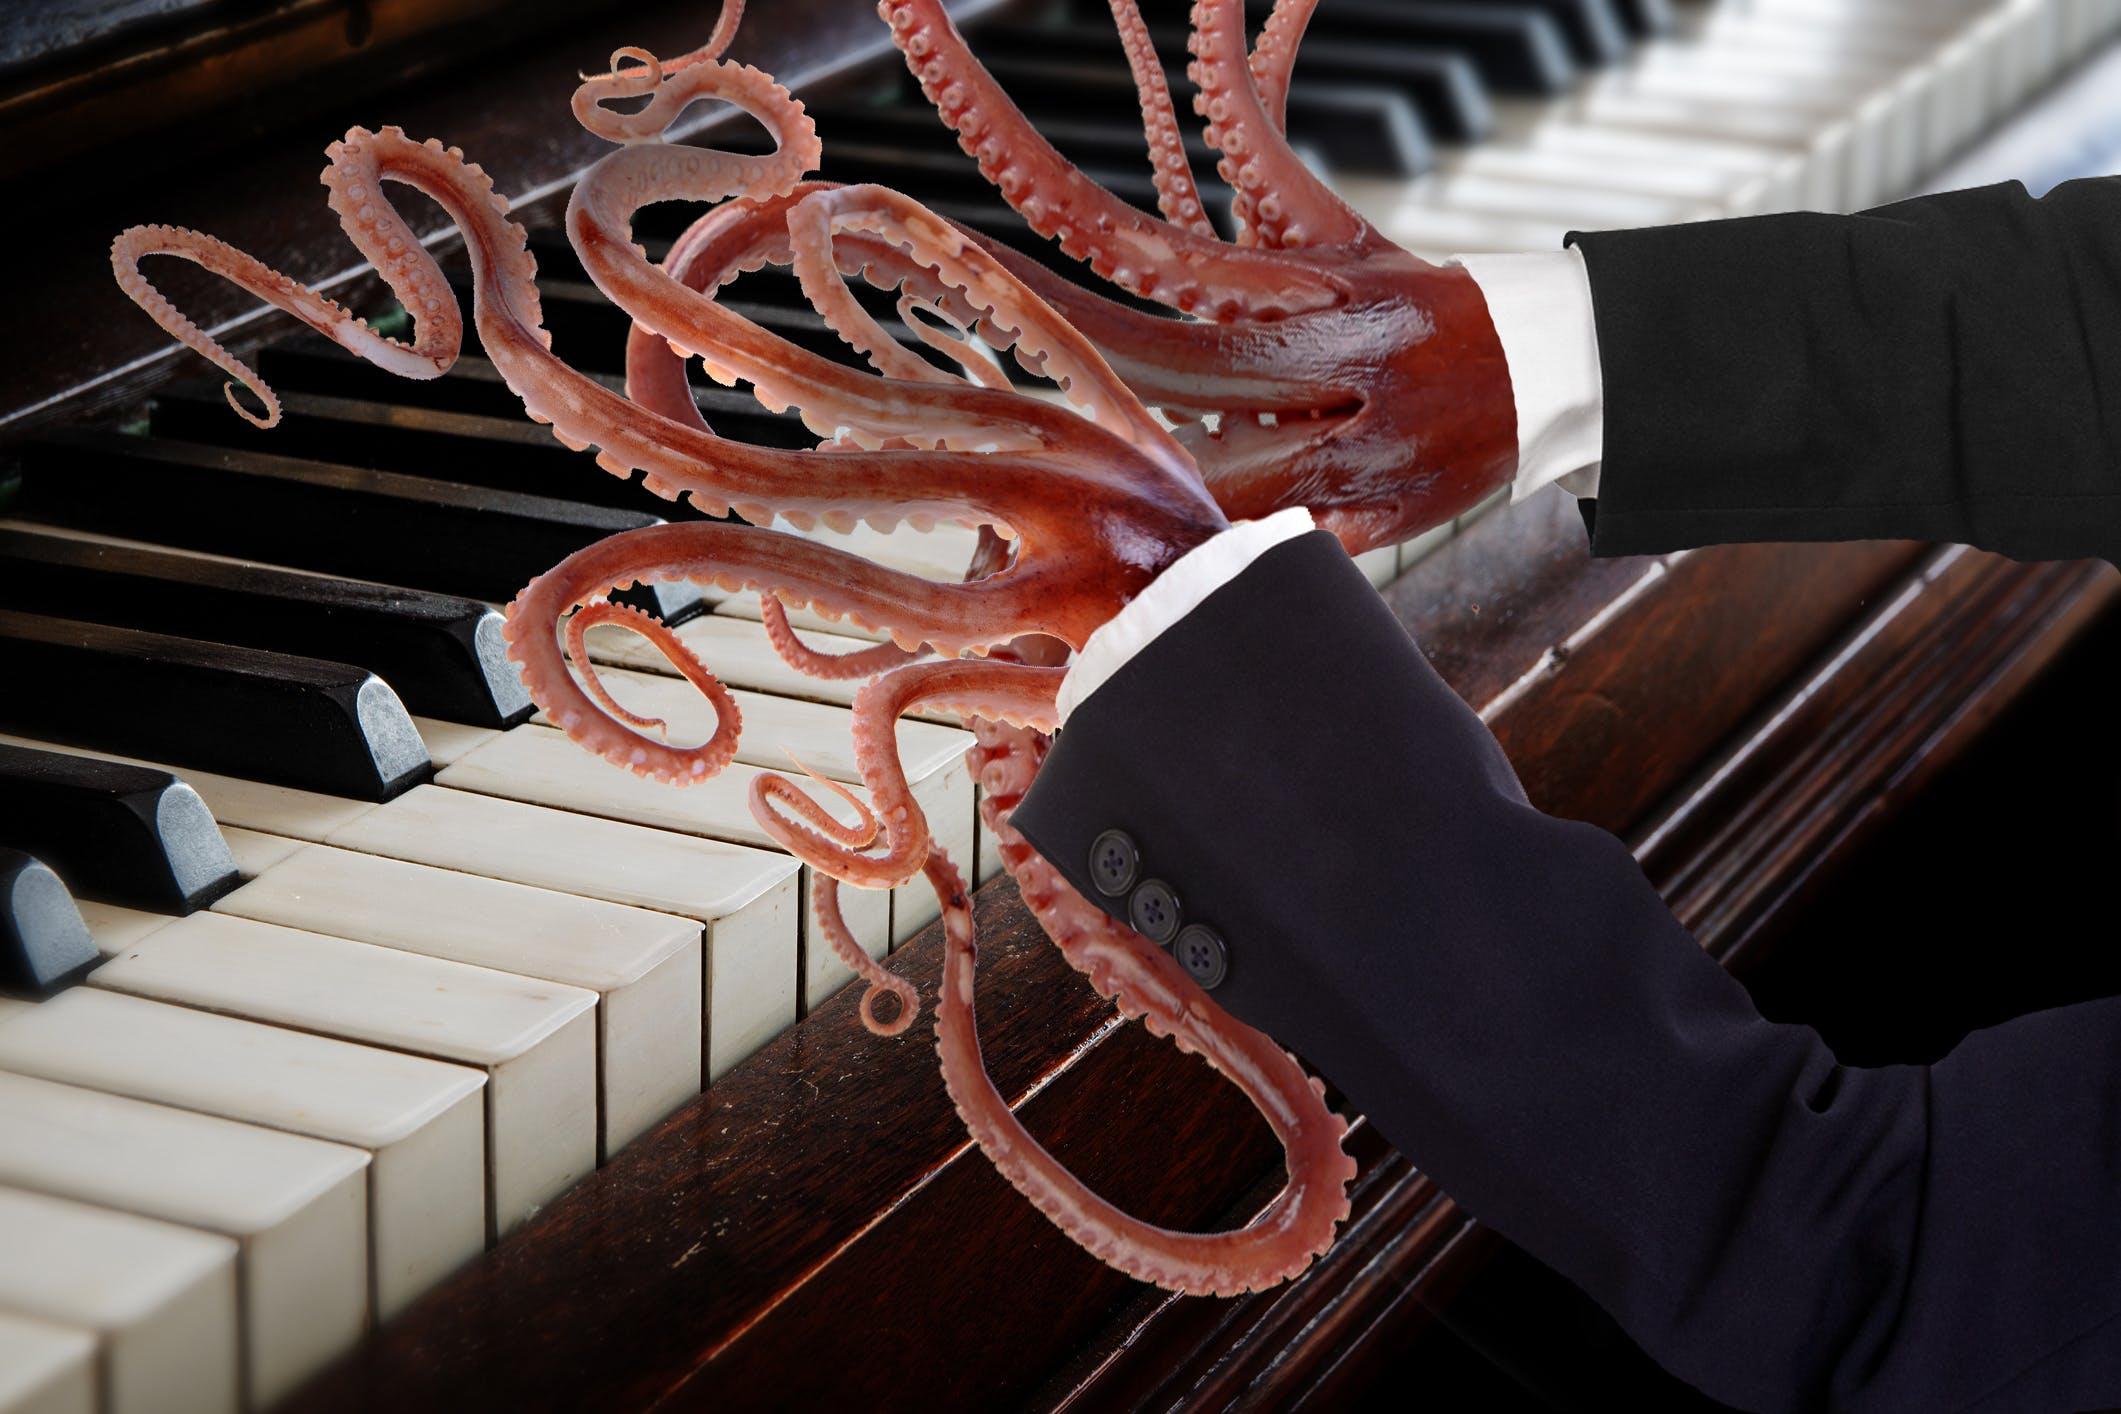 Octopus piano fingers